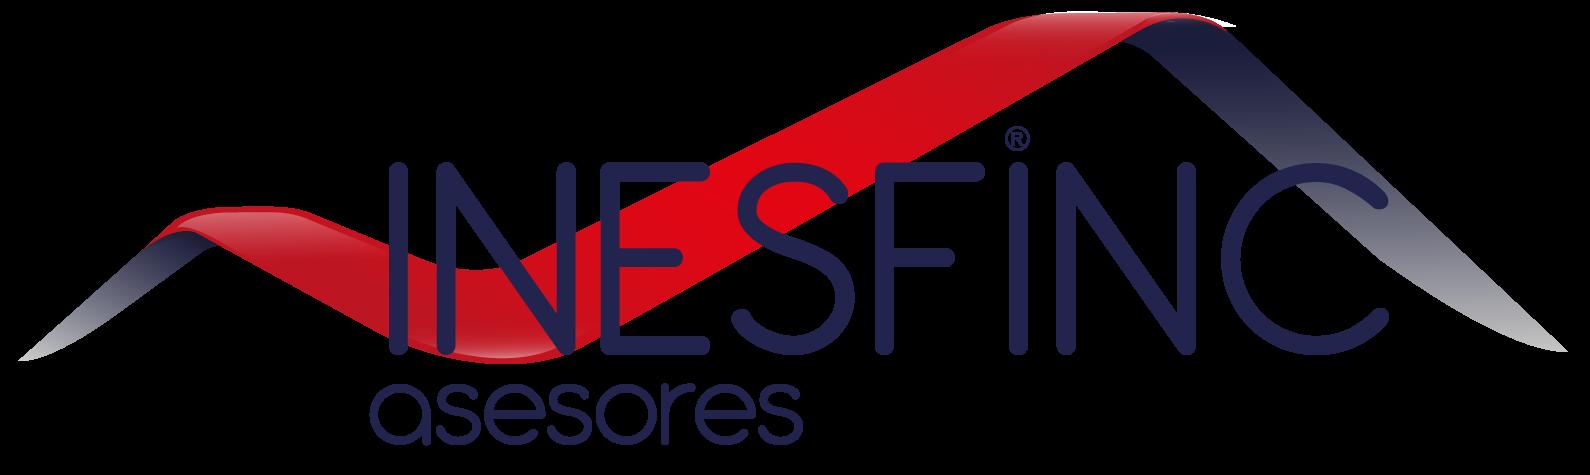 INESFINC ASESORES